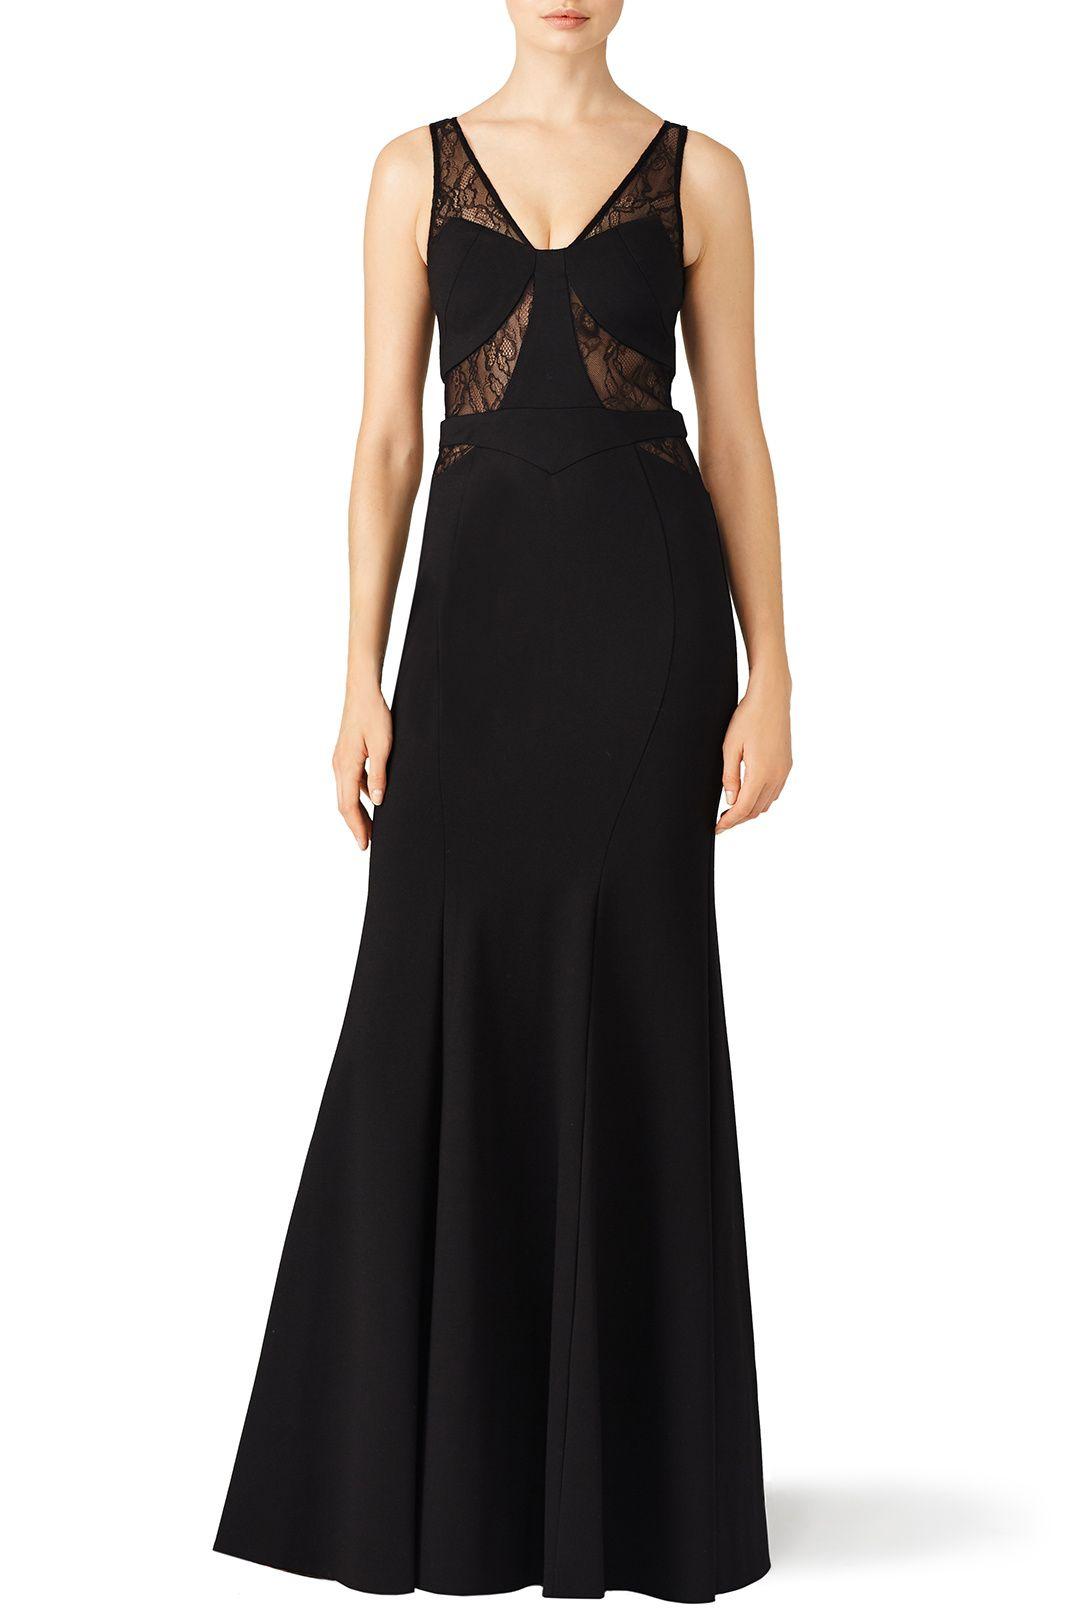 Black Lace Poise Gown   Pinterest   Black laces, Gowns and Dream ...